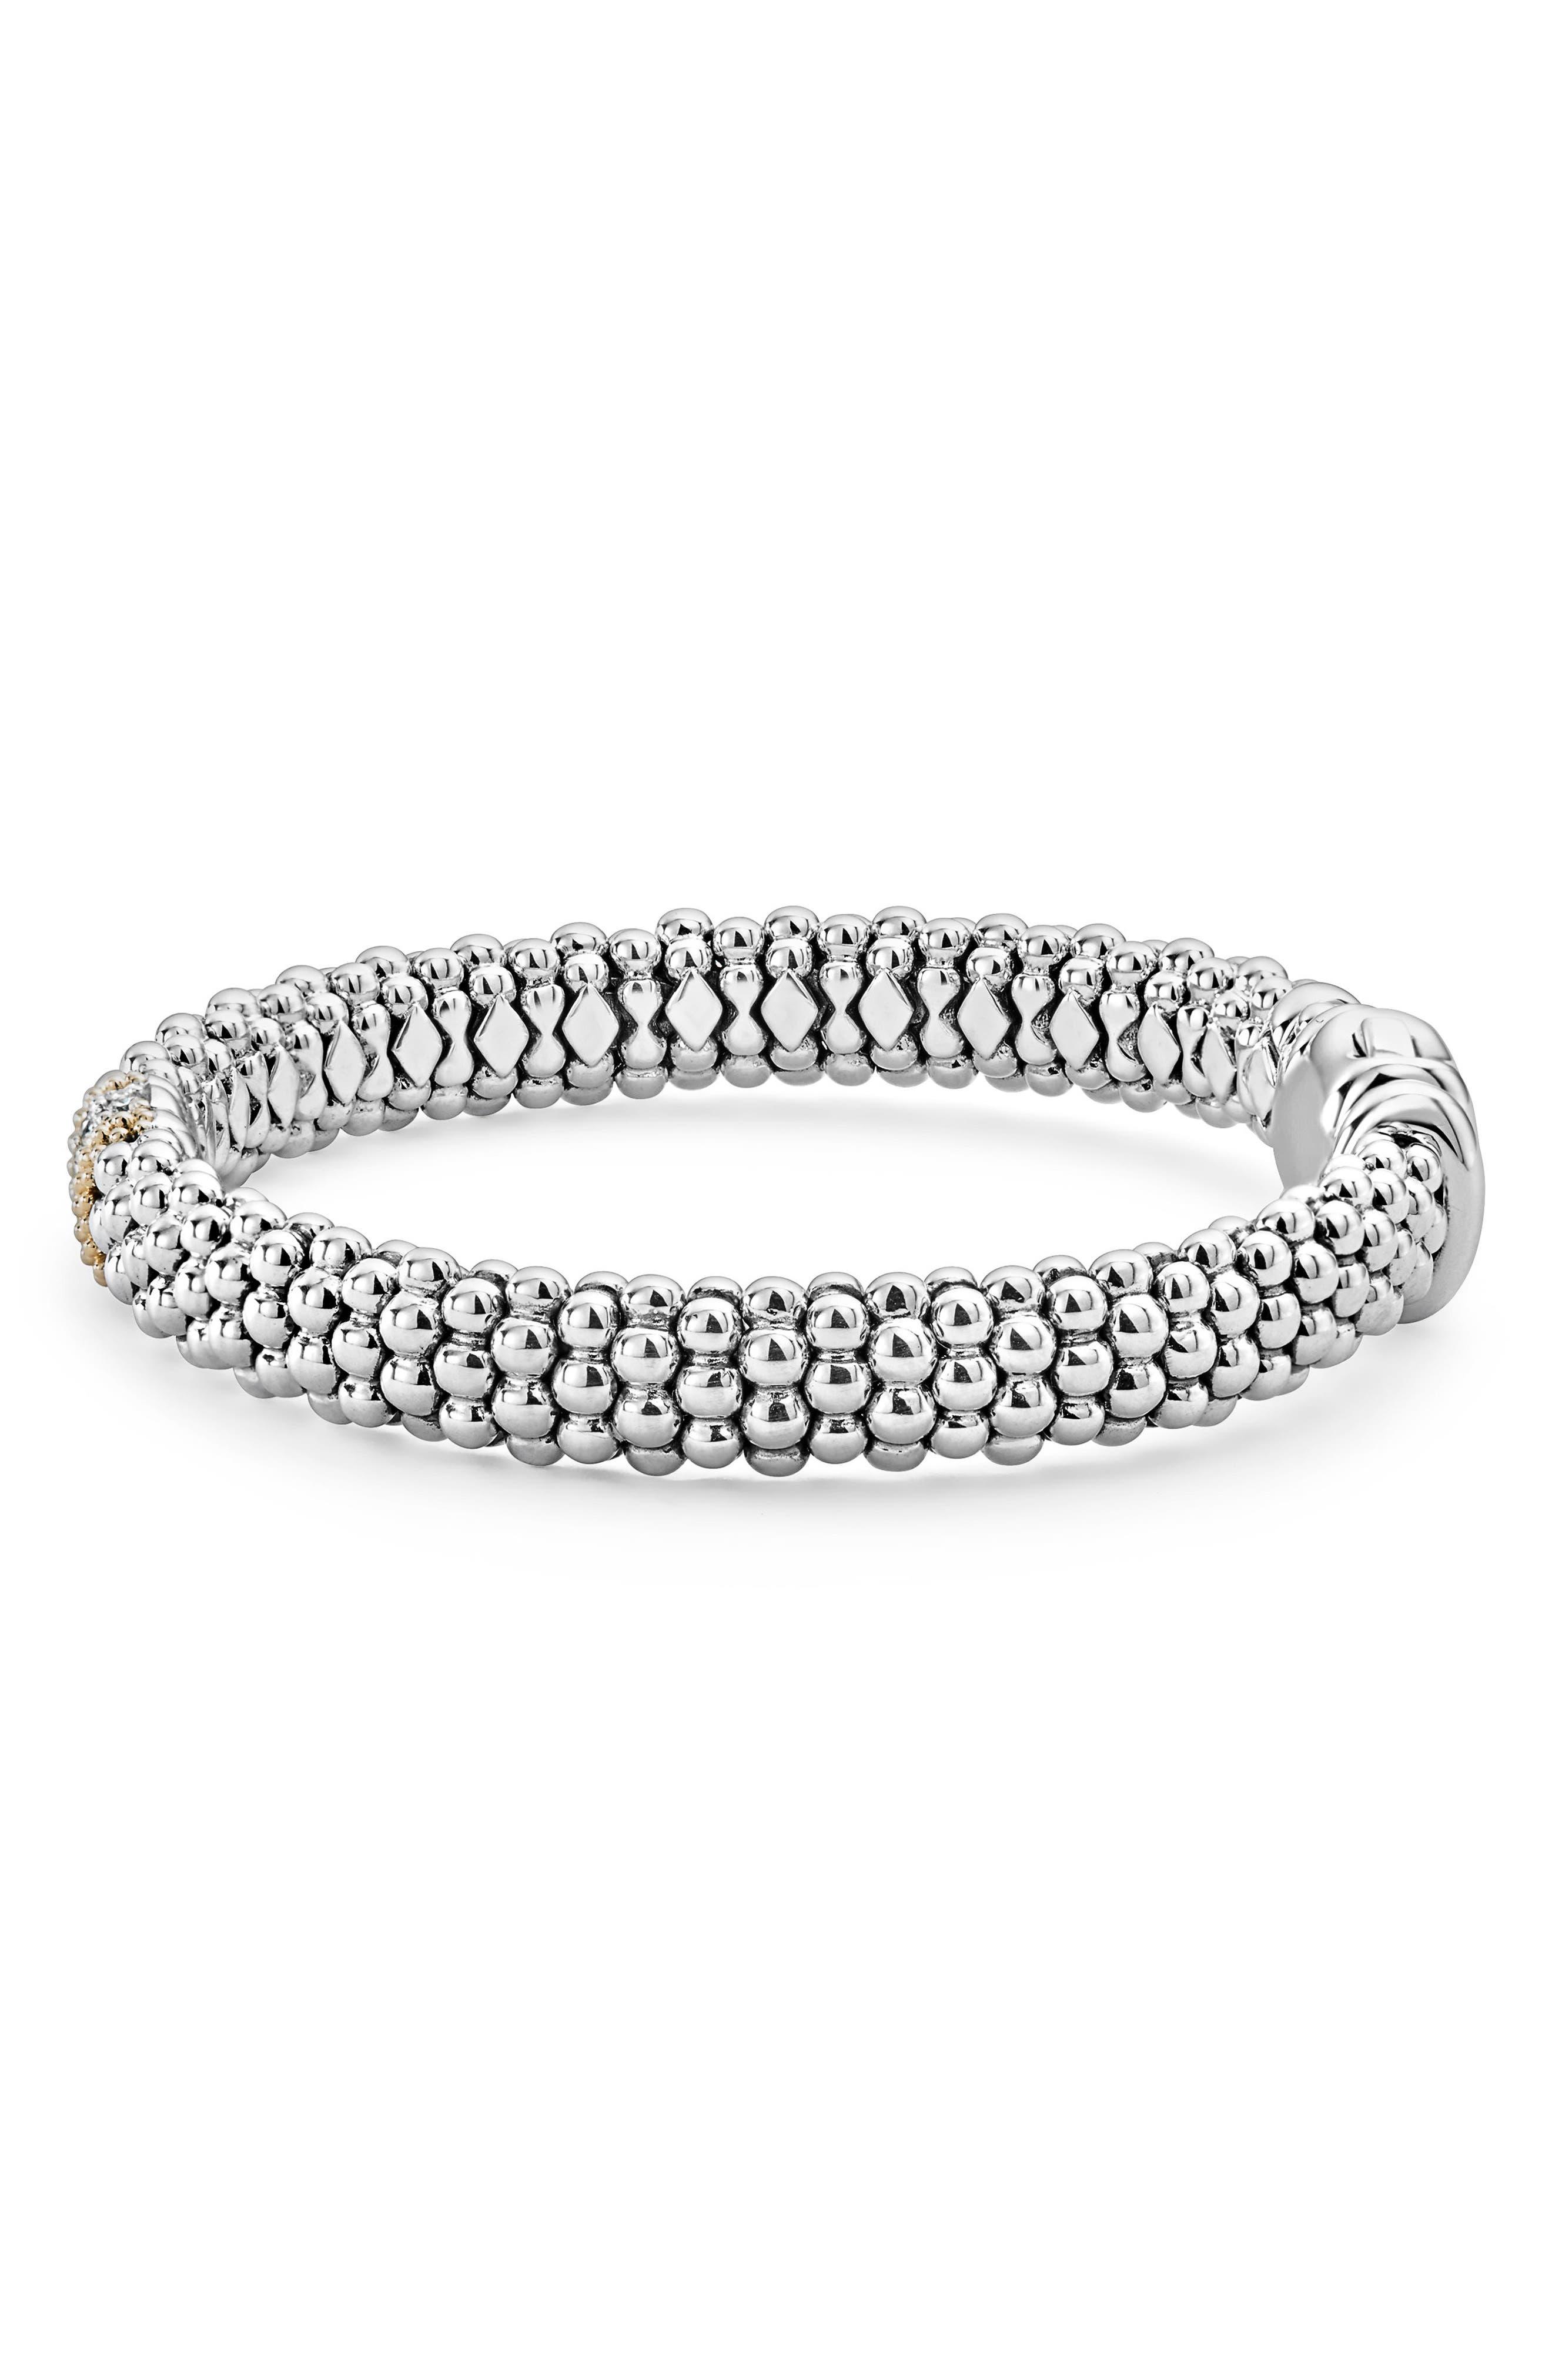 Luxe Pavé Diamond 9mm Bracelet,                             Alternate thumbnail 4, color,                             DIAMOND